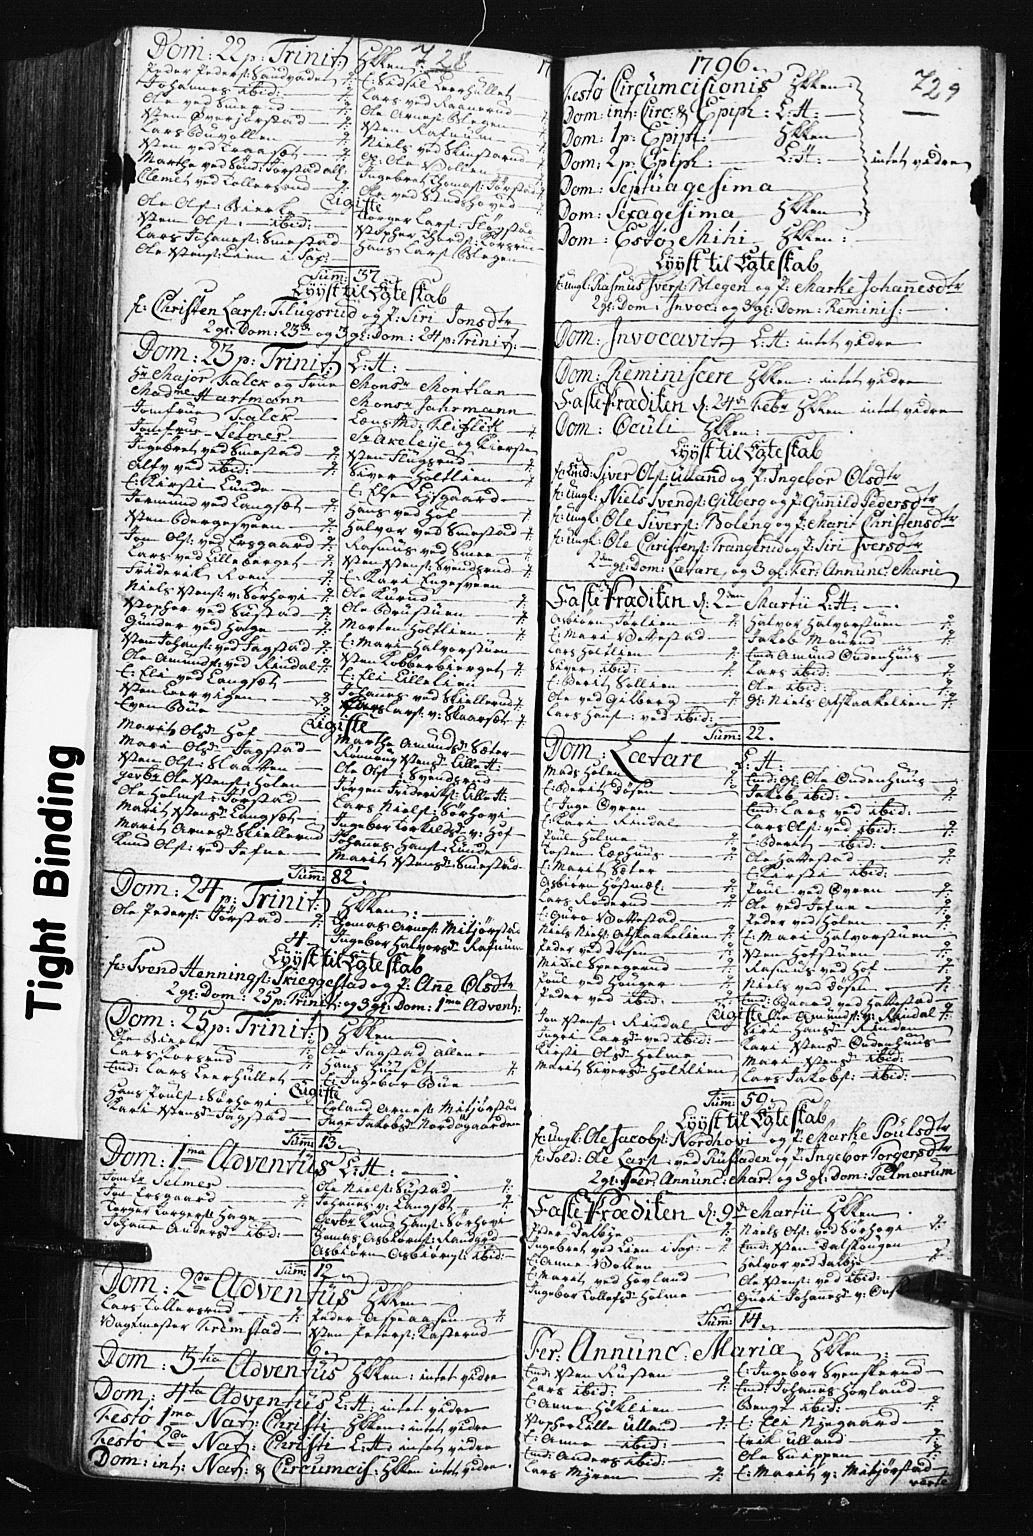 SAH, Fåberg prestekontor, Klokkerbok nr. 3, 1768-1796, s. 728-729